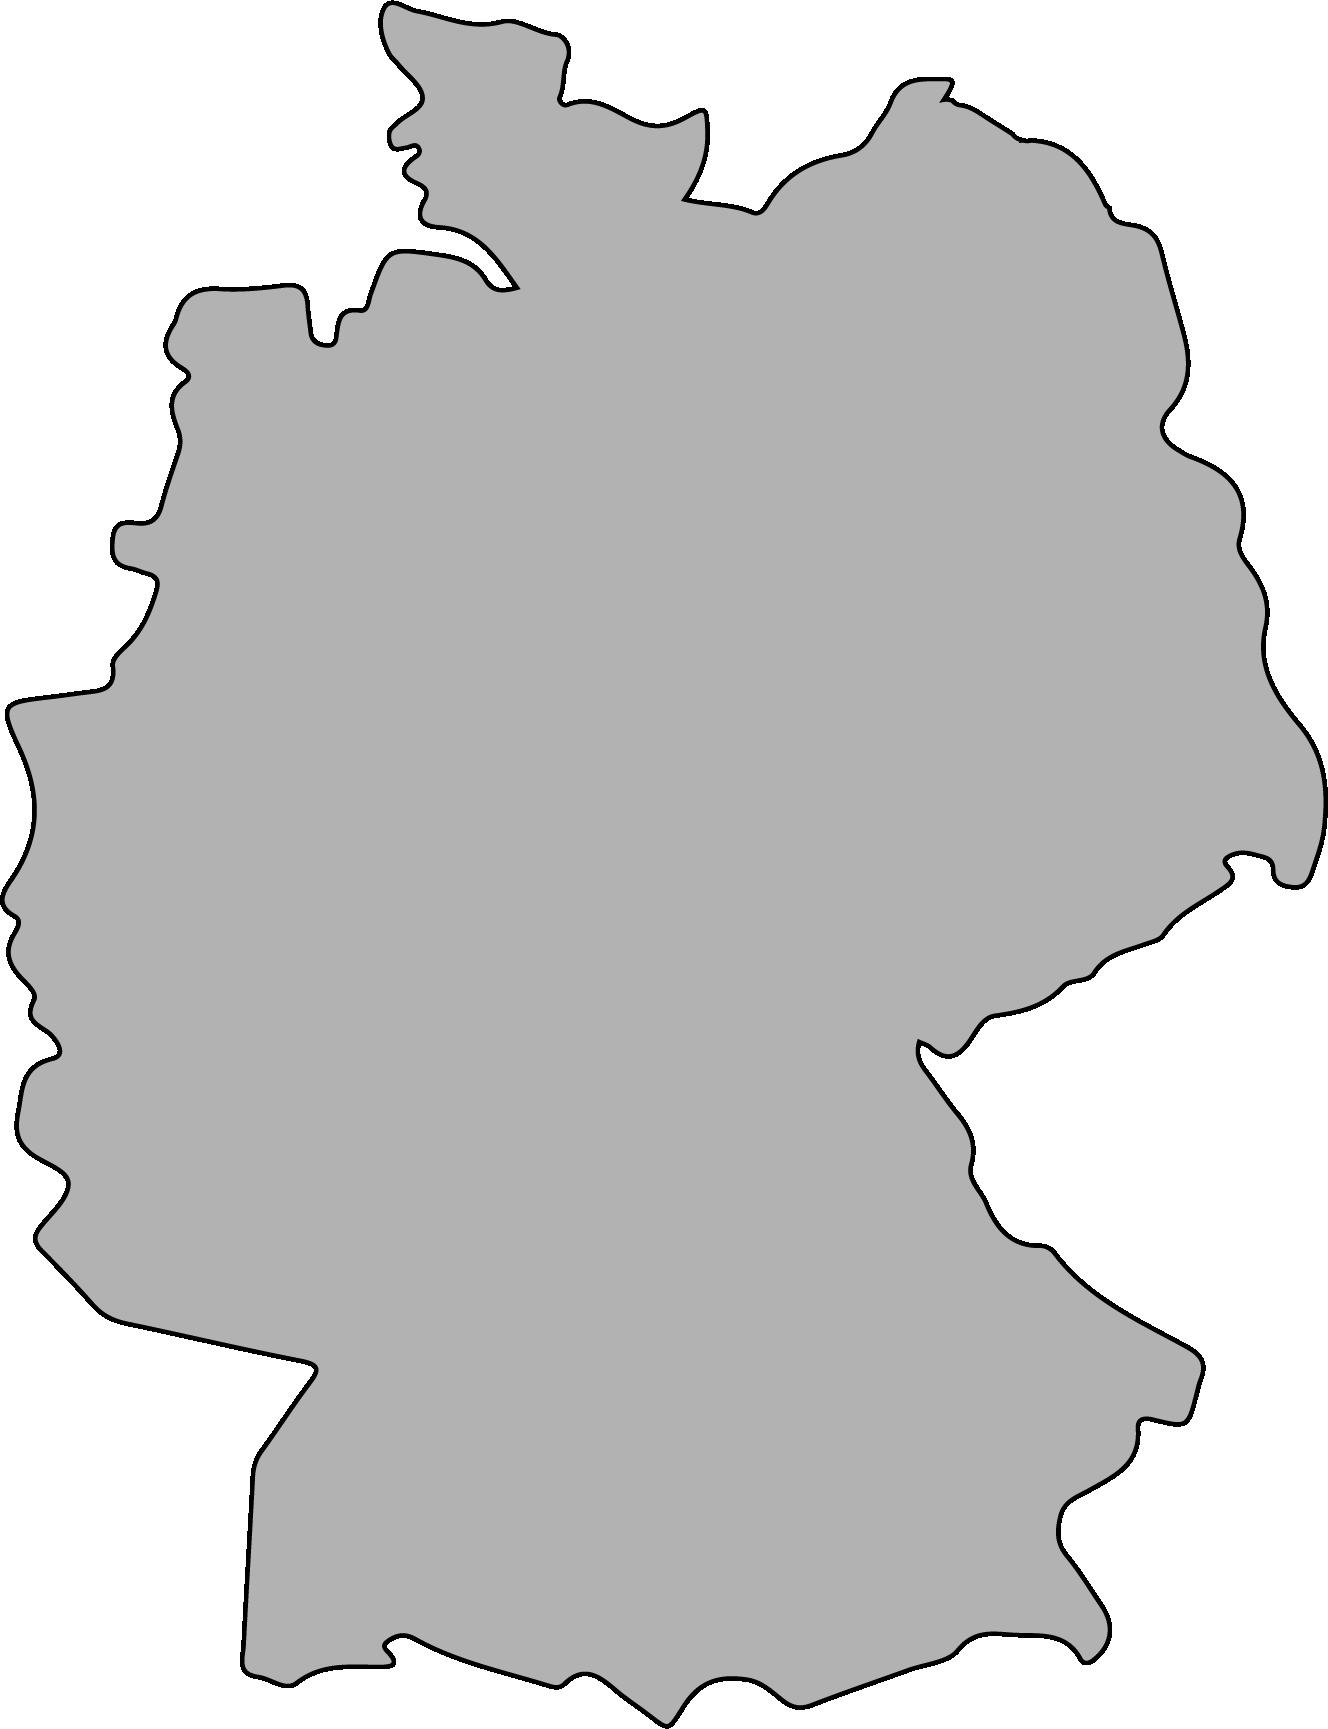 Germany borders image